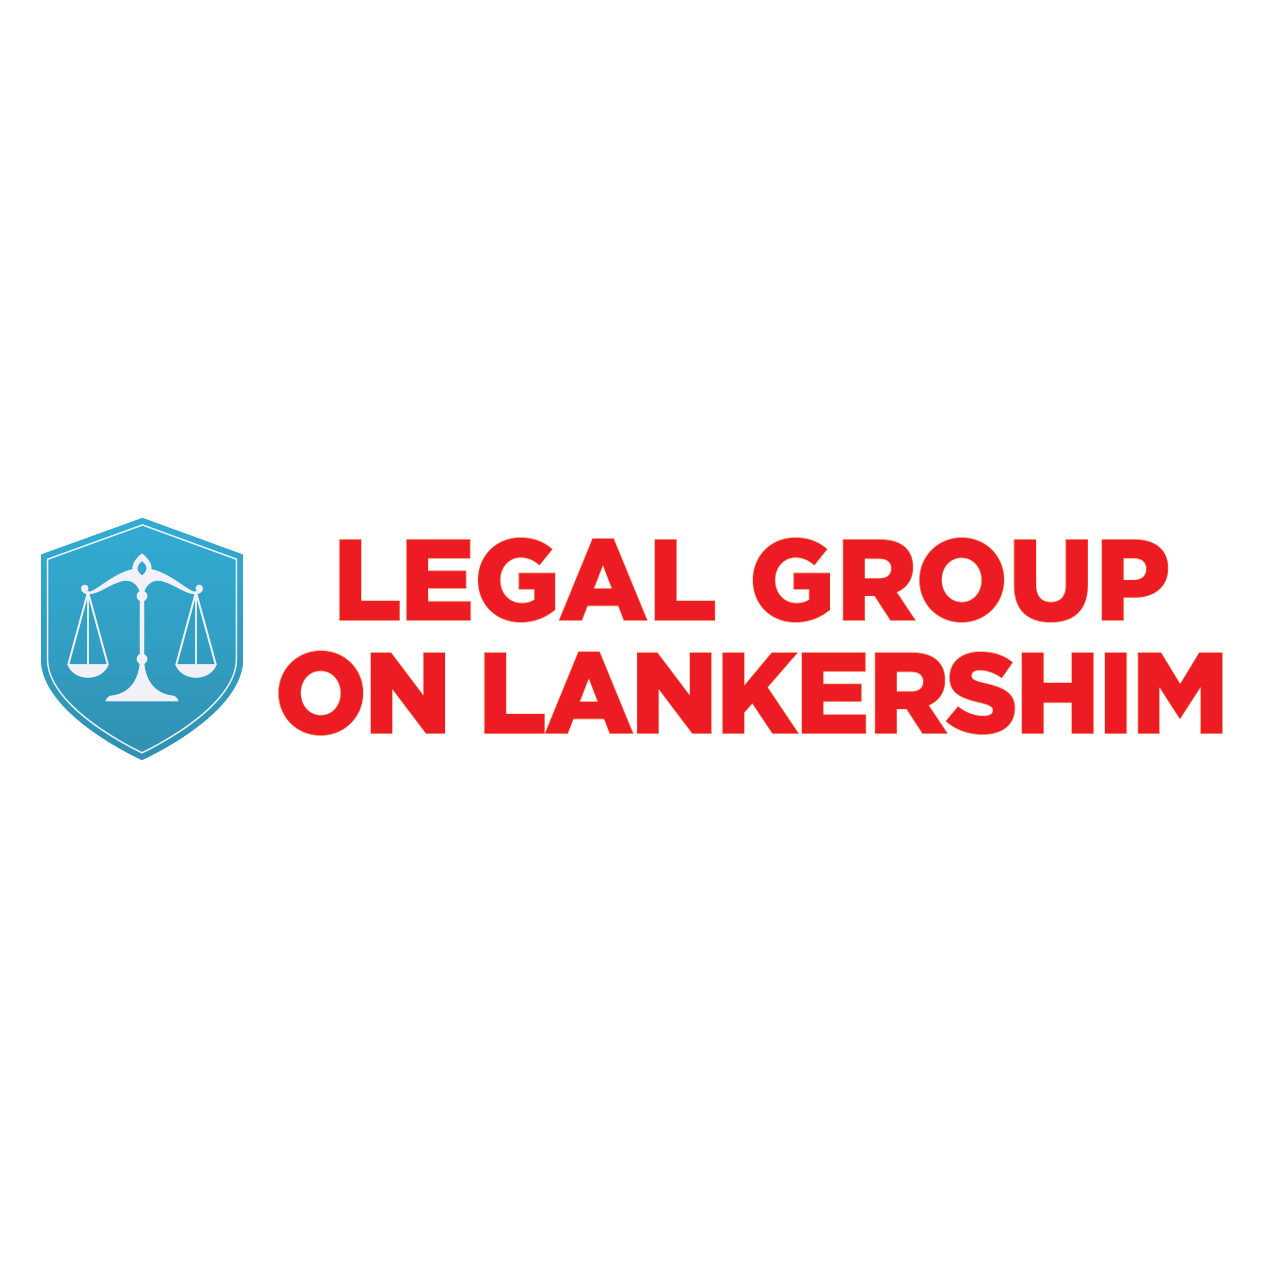 Legal Group on Lankershim